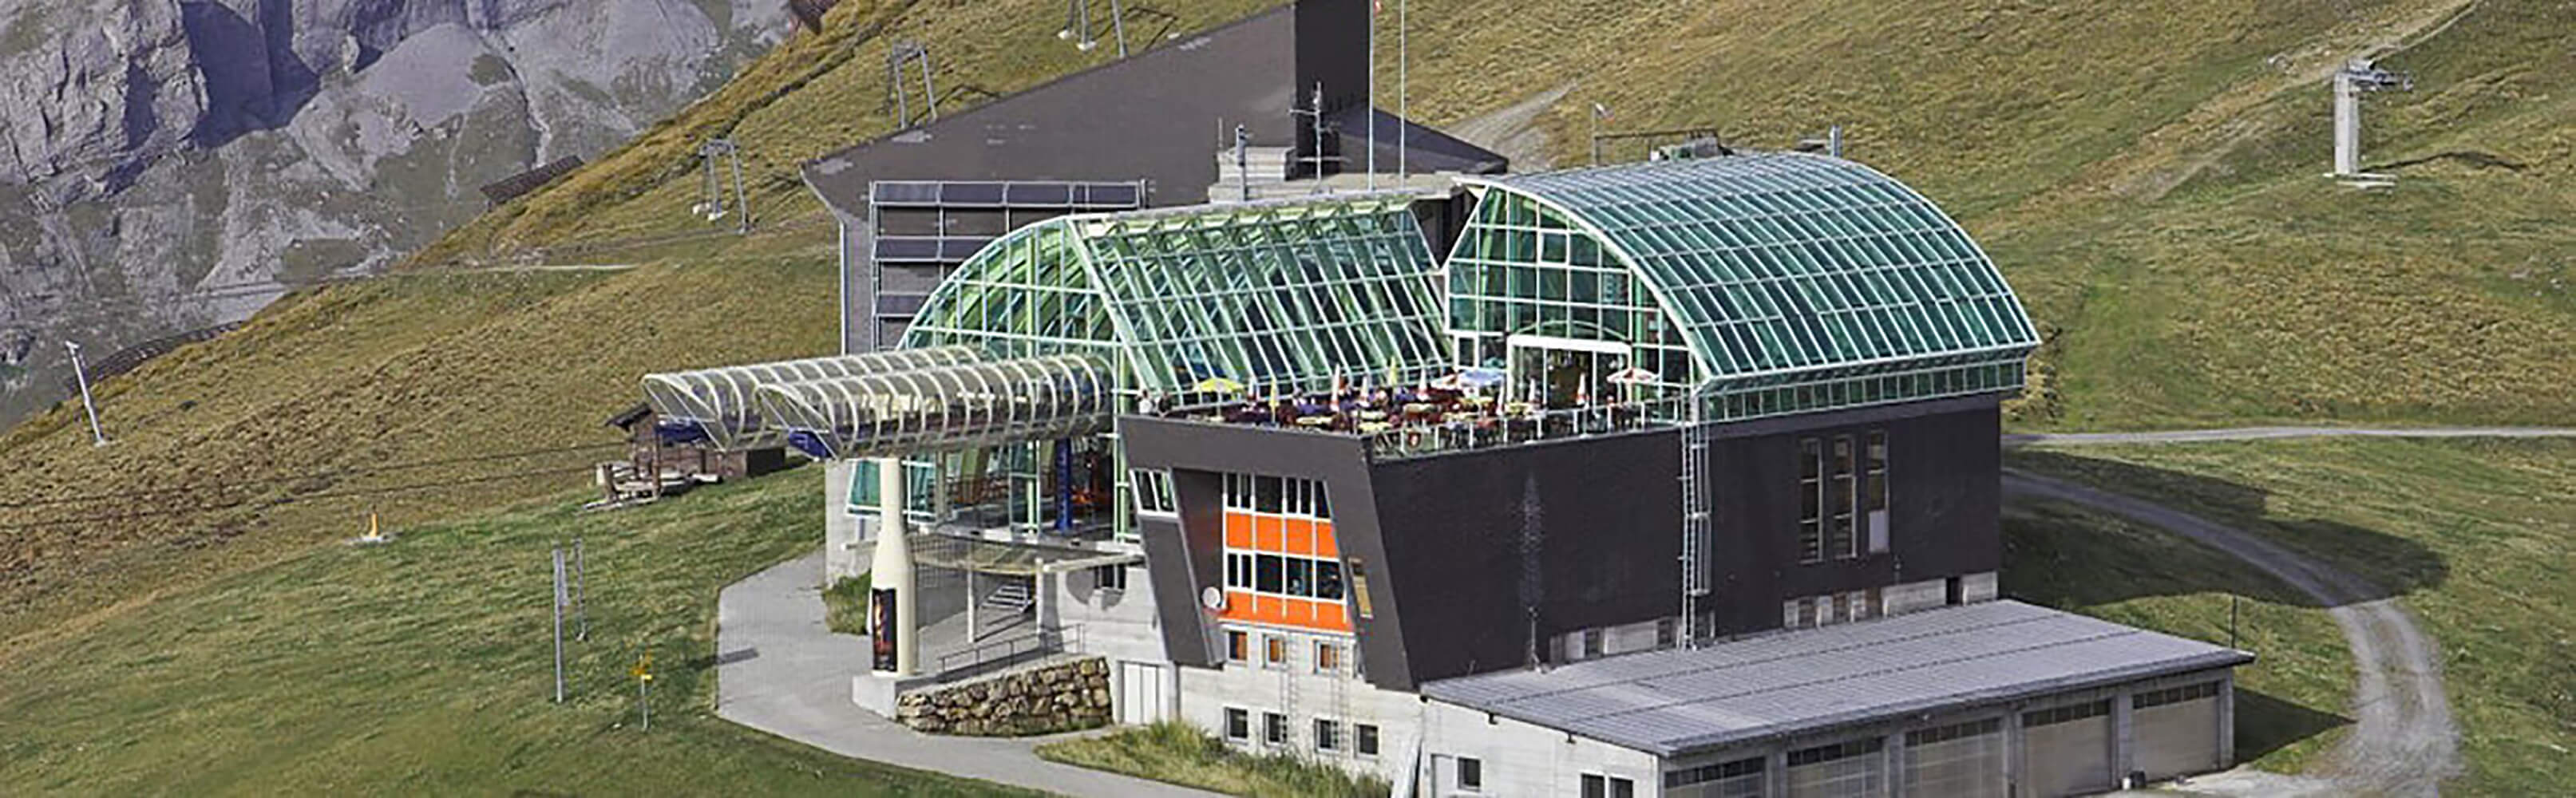 Torrent-Bahnen Leukerbad-Albinen - Hoch hinaus 1